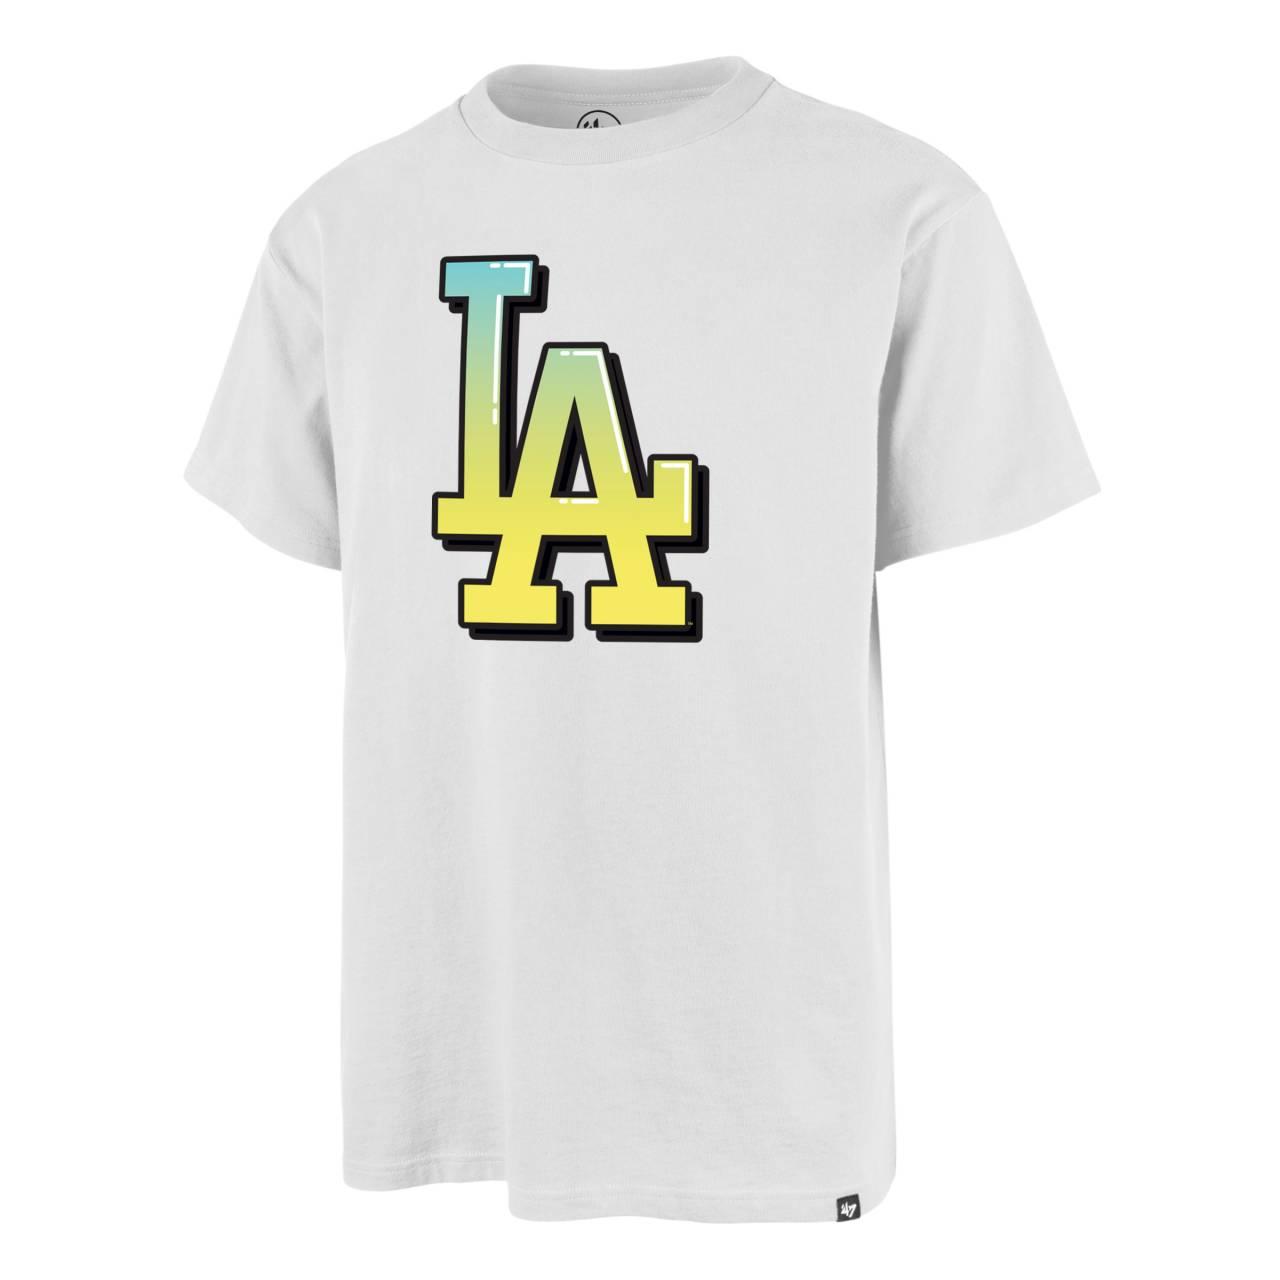 T-SHIRT MLB LOS ANGELES DODGERS LOGO WEISS